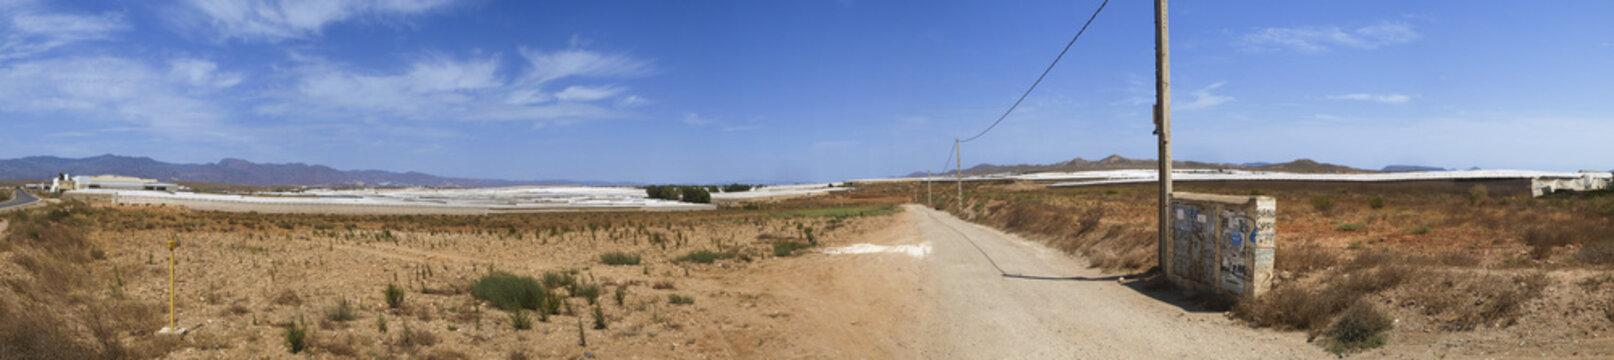 Spanien, Andalusien, Almeria, Mar del Plastico, Anbaufächen in